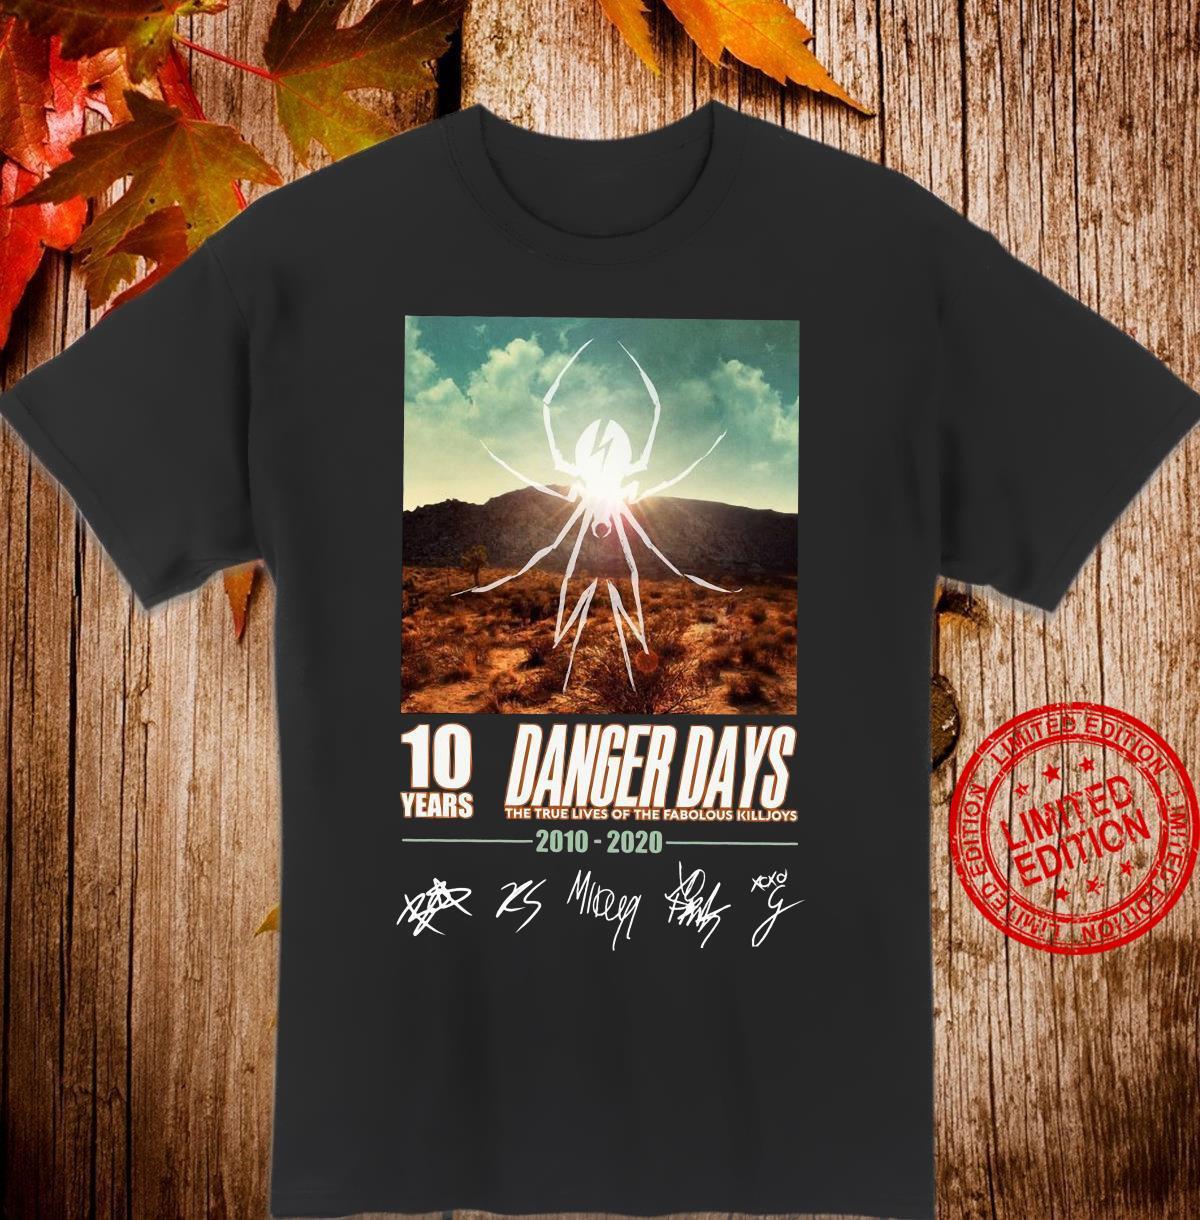 10 years Dancer days the true lives of the fabulous killjoys 2010 2020 shirt